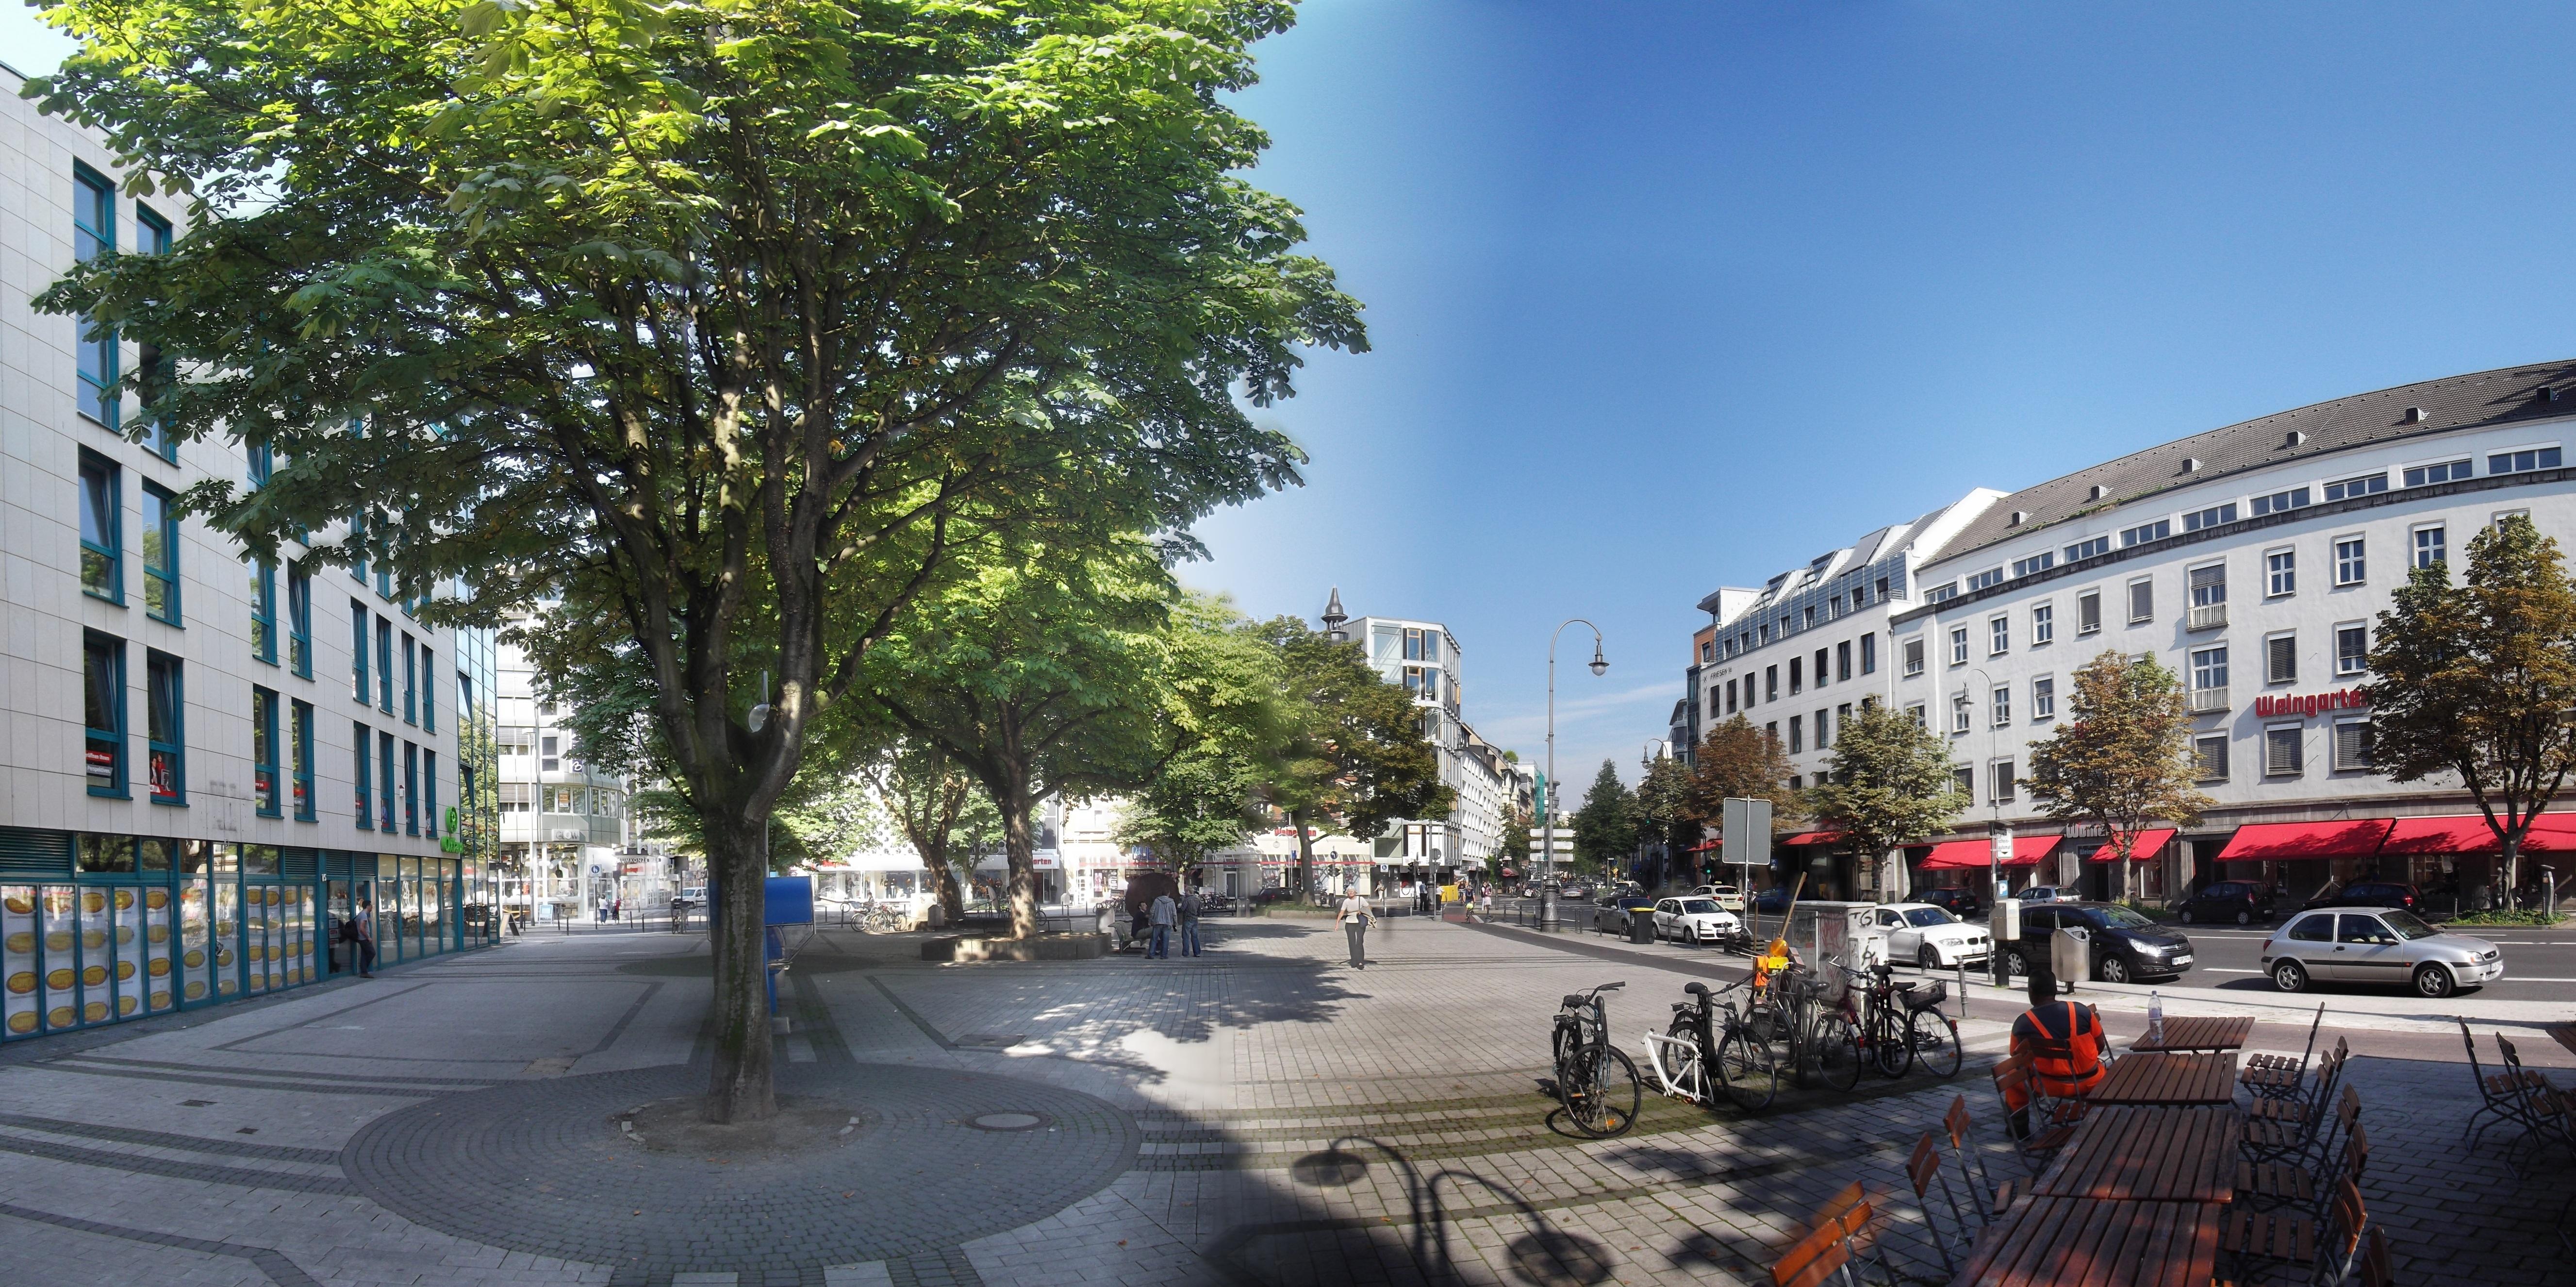 Friesenplatz Koeln pano.jpg